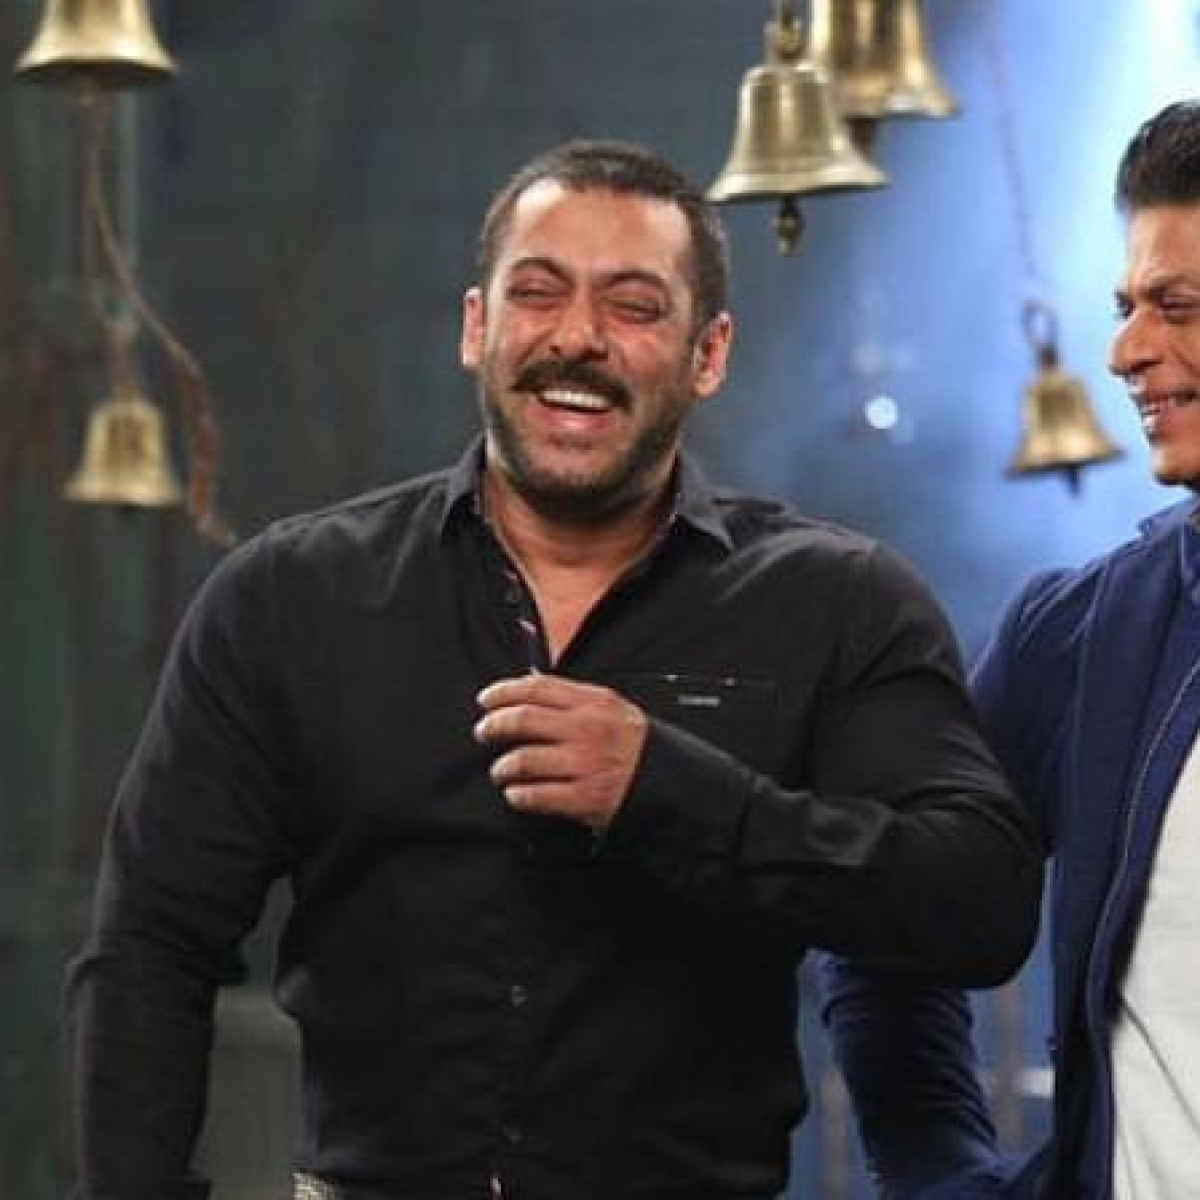 Salman Khan to shoot for Shah Rukh Khan's 'Pathan' post 'Bigg Boss 14'